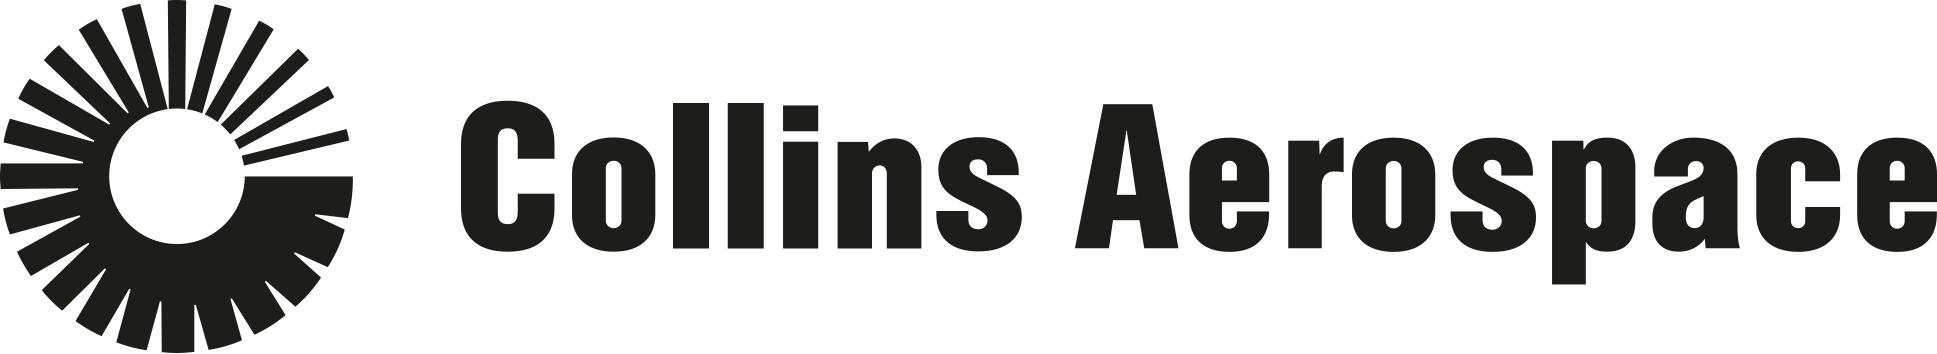 Collins-Aerospace_Primary_Black.jpg